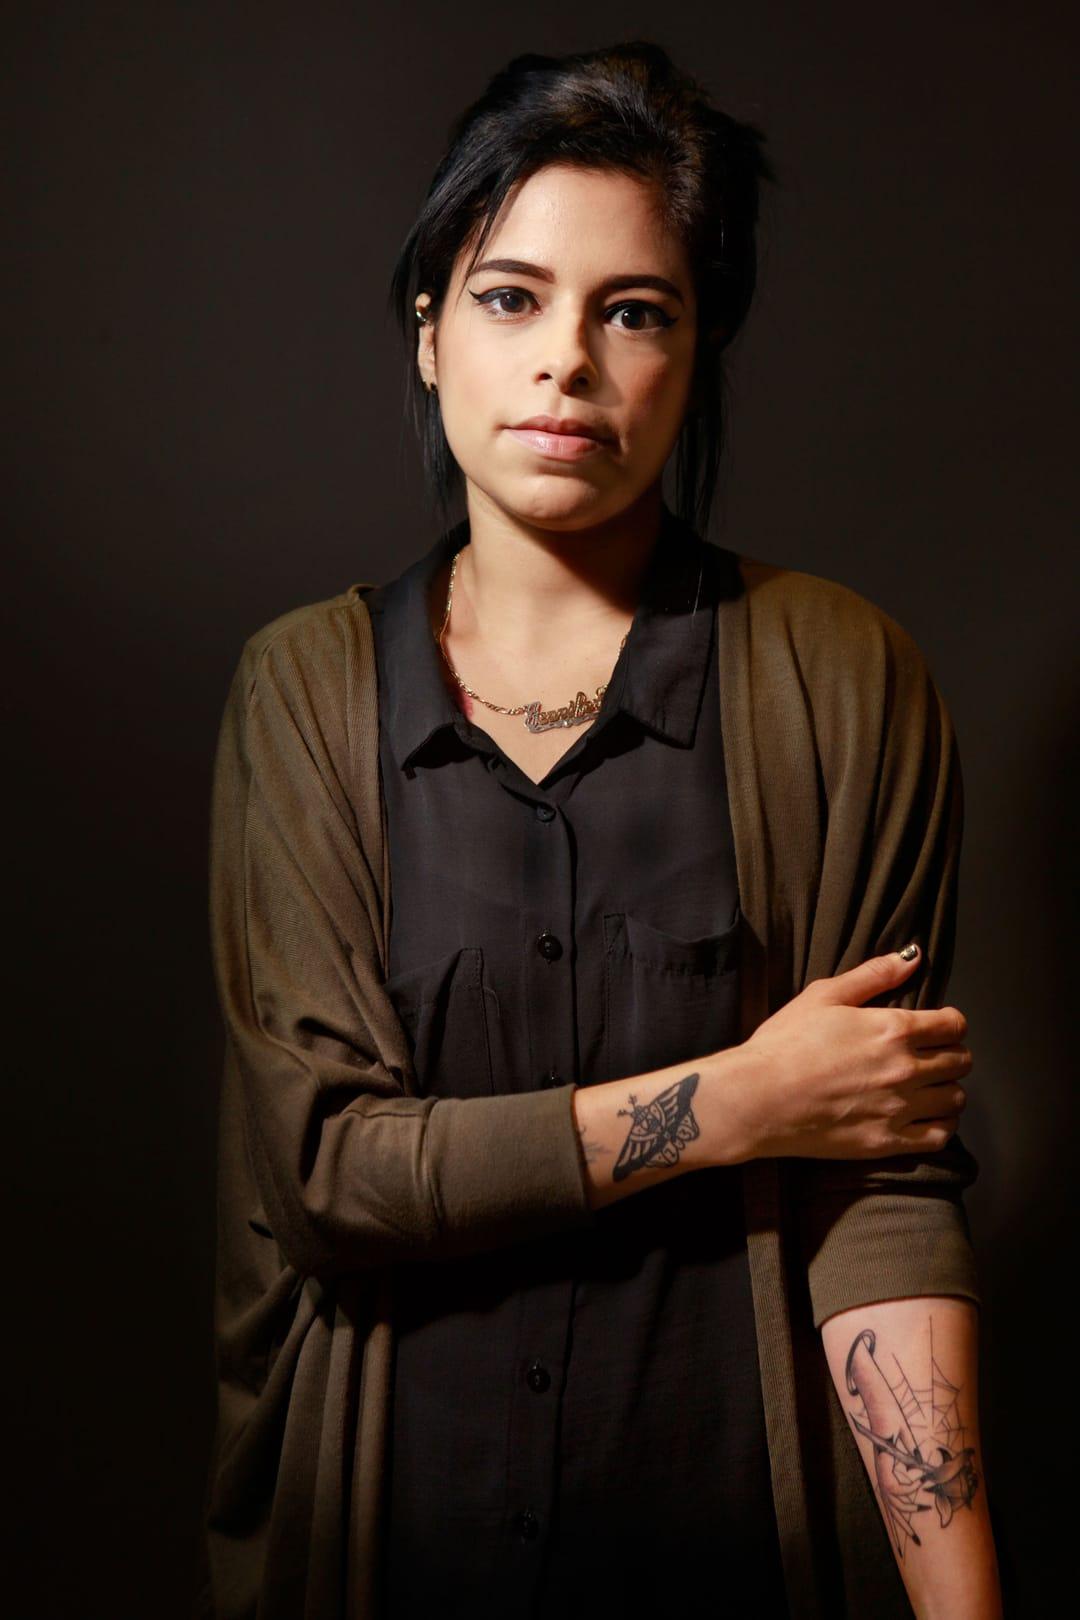 Jennifer Diaz, photo by Marisha Camp